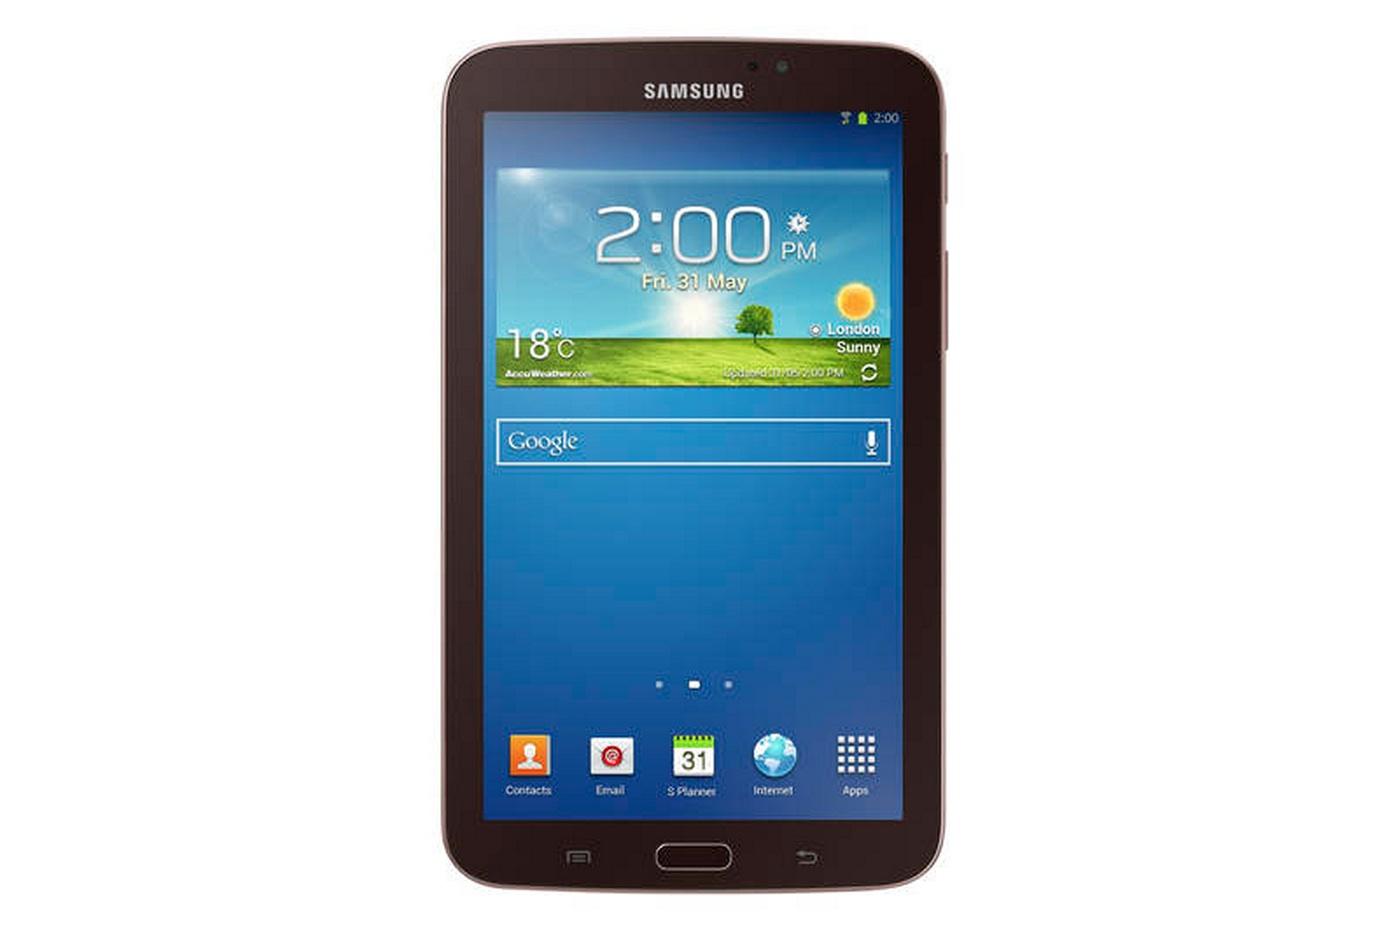 Samsung Galaxy Tab 3 7.0 - экран и лицевая панель